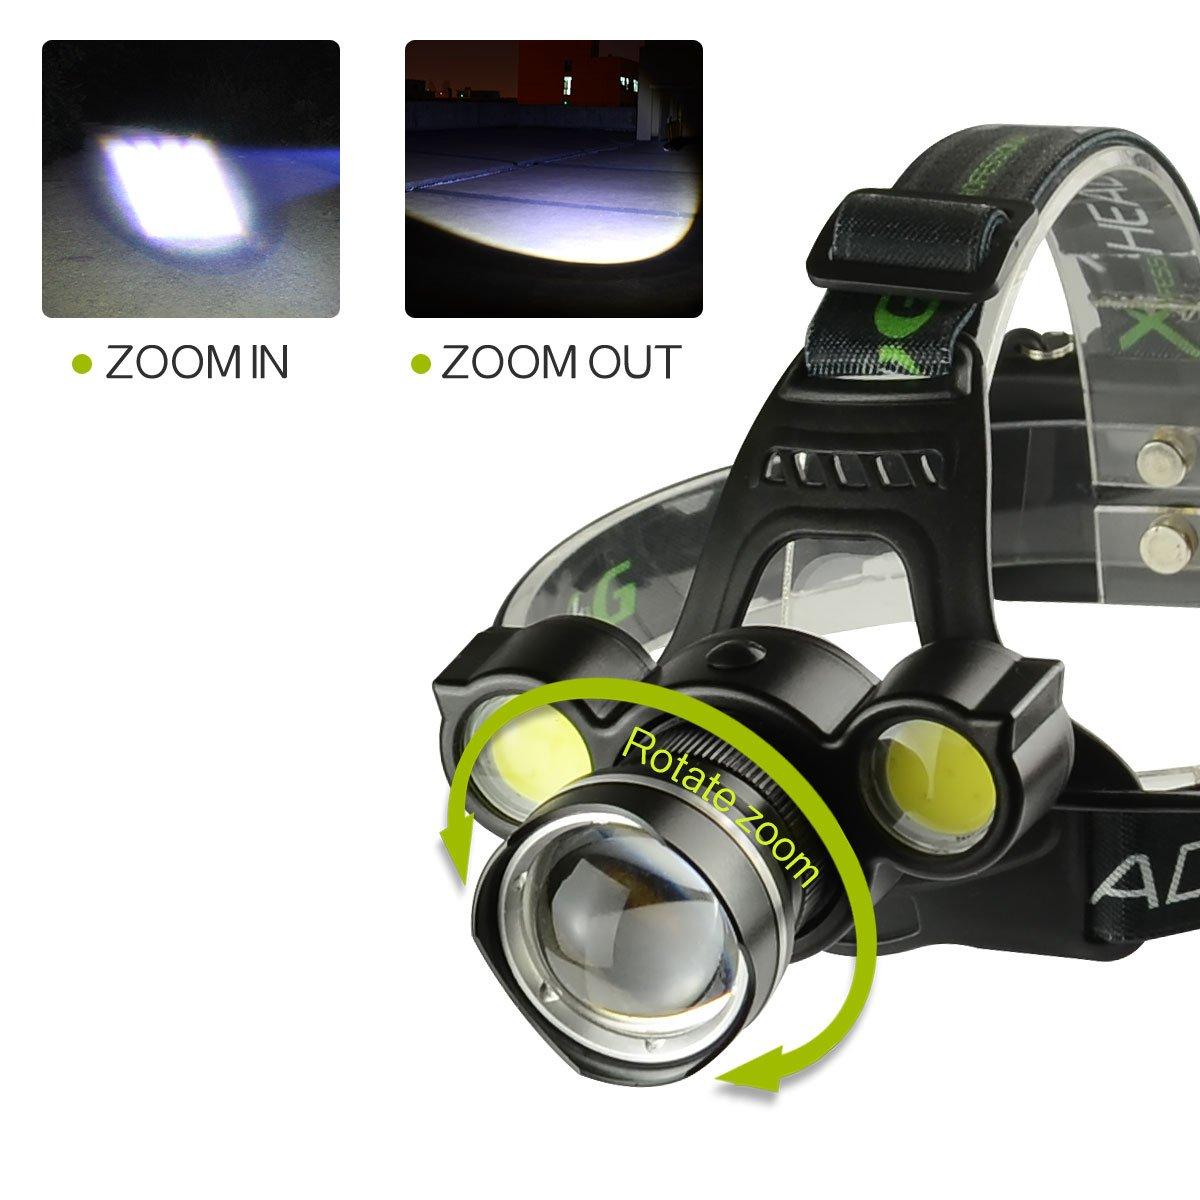 ENCEURO Linterna Frontal Recargable de Cabeza luz LED 8000LM T6 4X COB Zoom Impermeable ROTARU Zoom